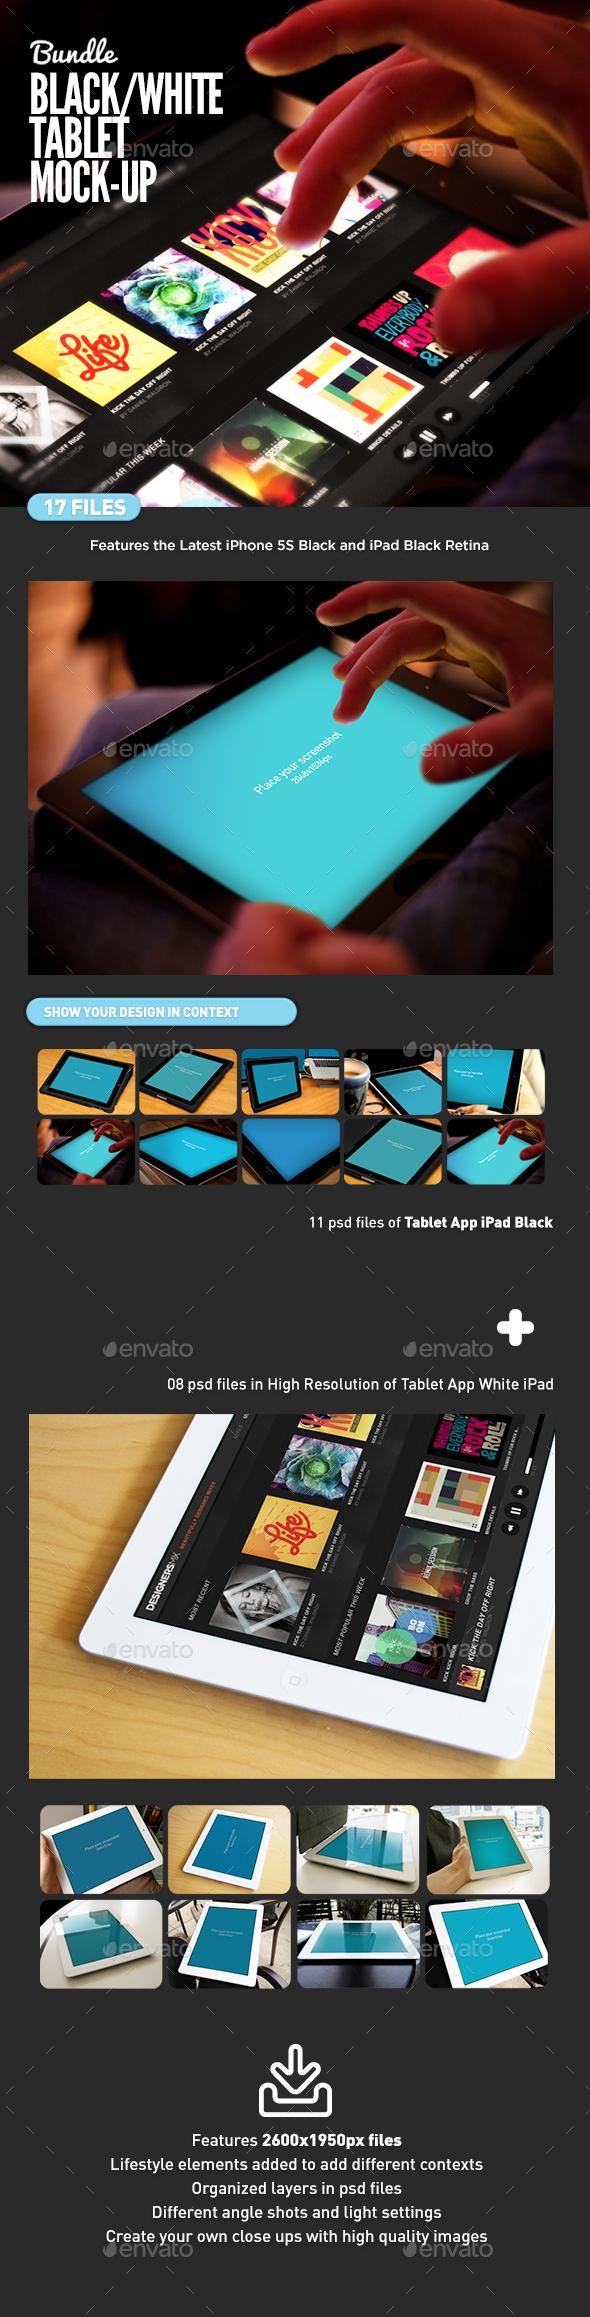 Black and White Pad Tablet MockUp Bundle - Mobile Displays